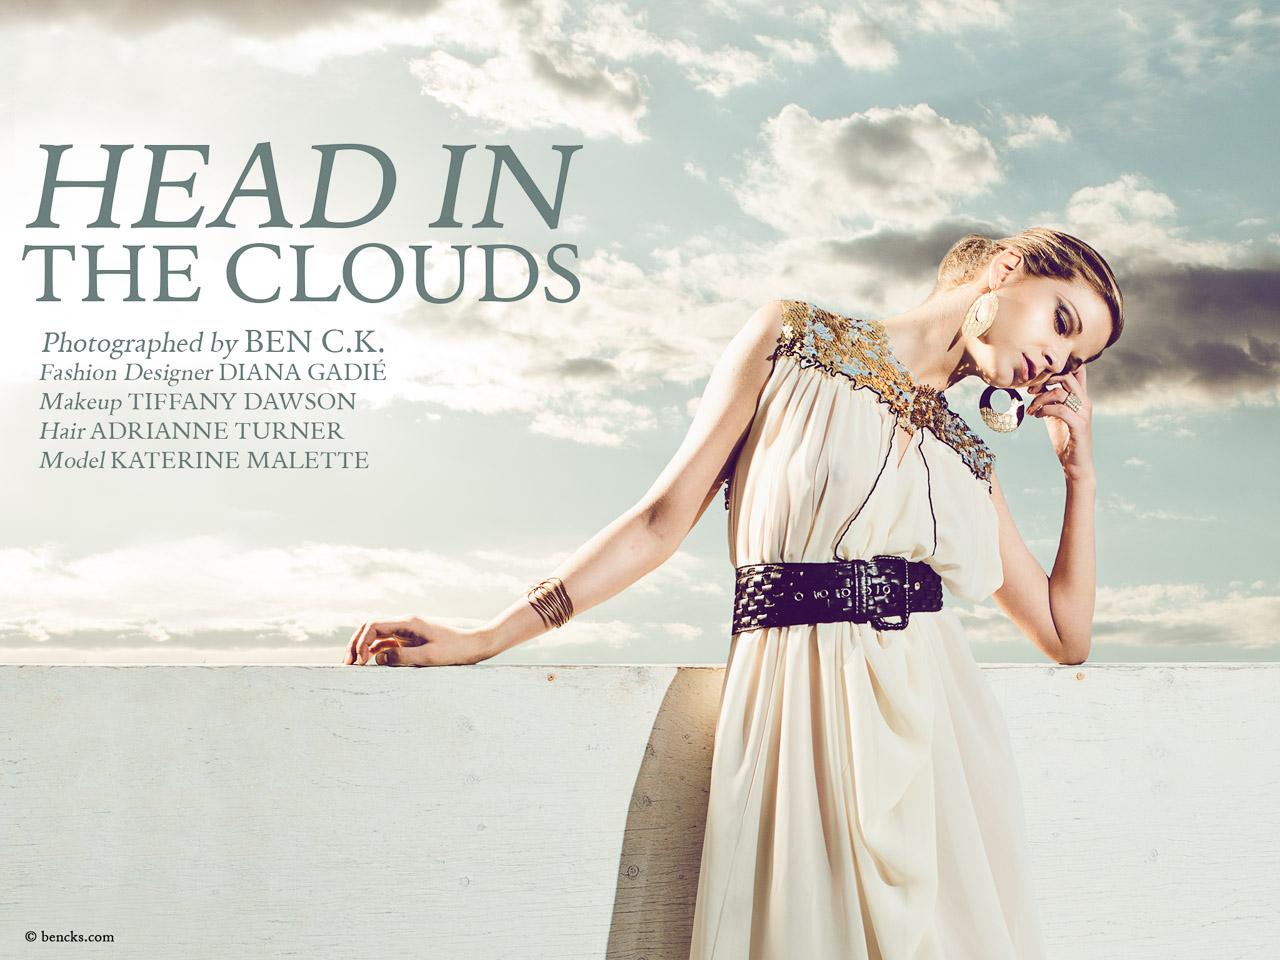 Head in the clouds P1P2